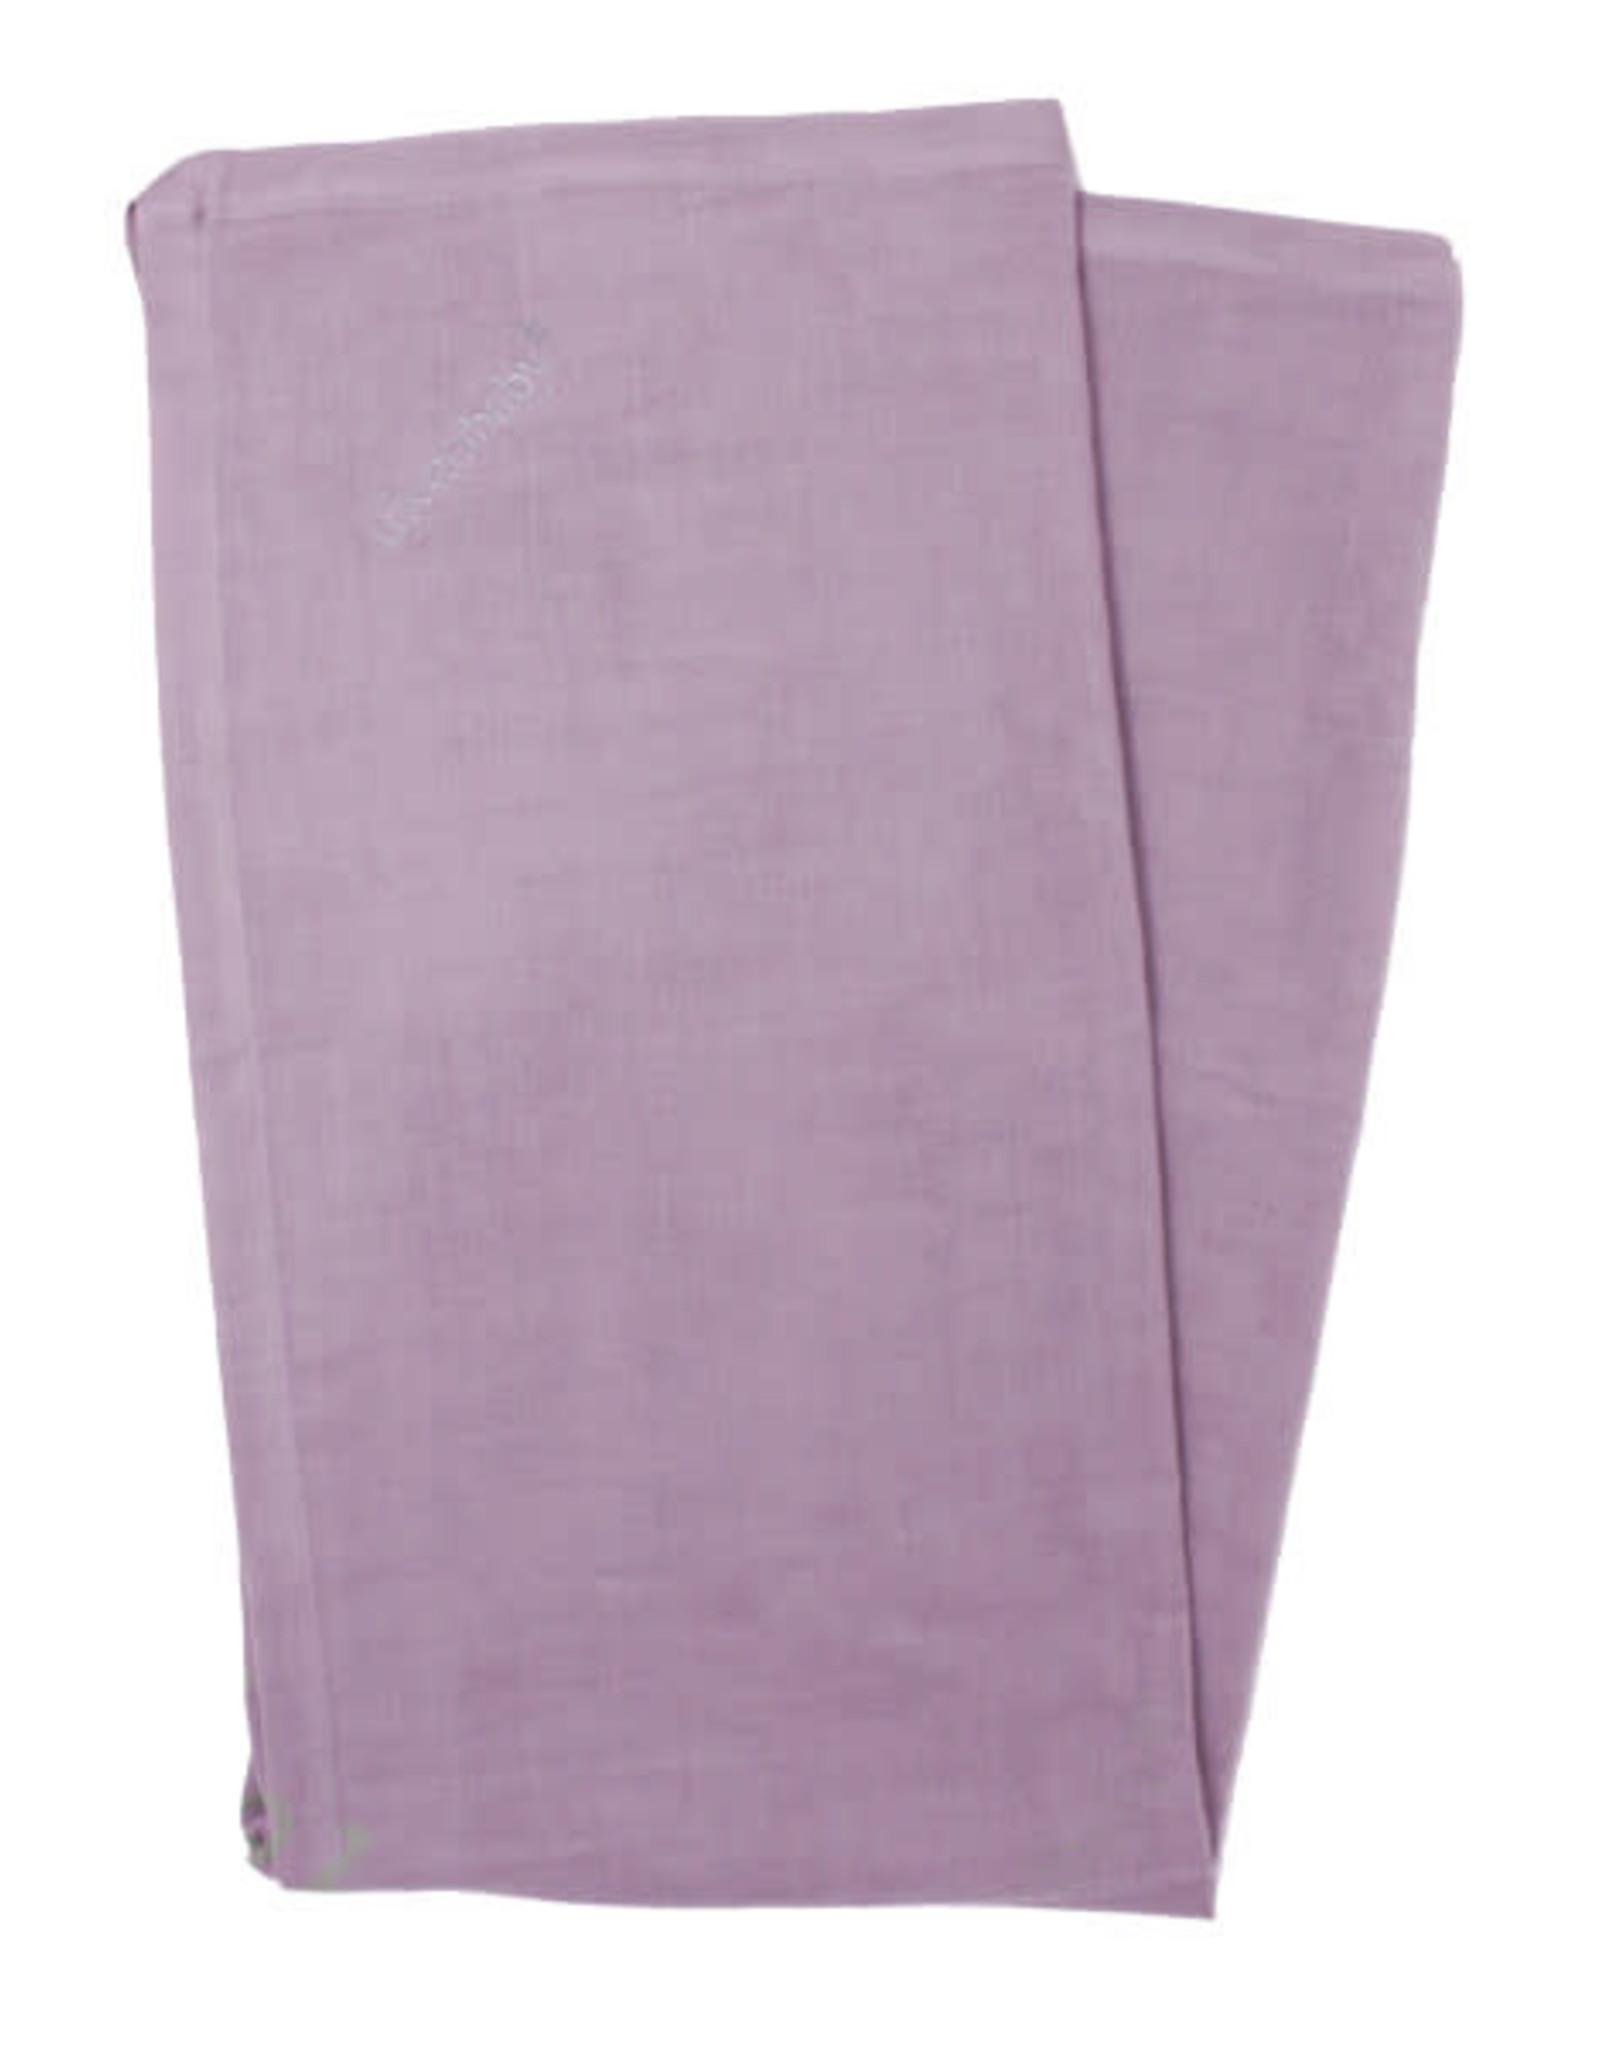 L'oved Baby Muslin Security Blanket Amethyst